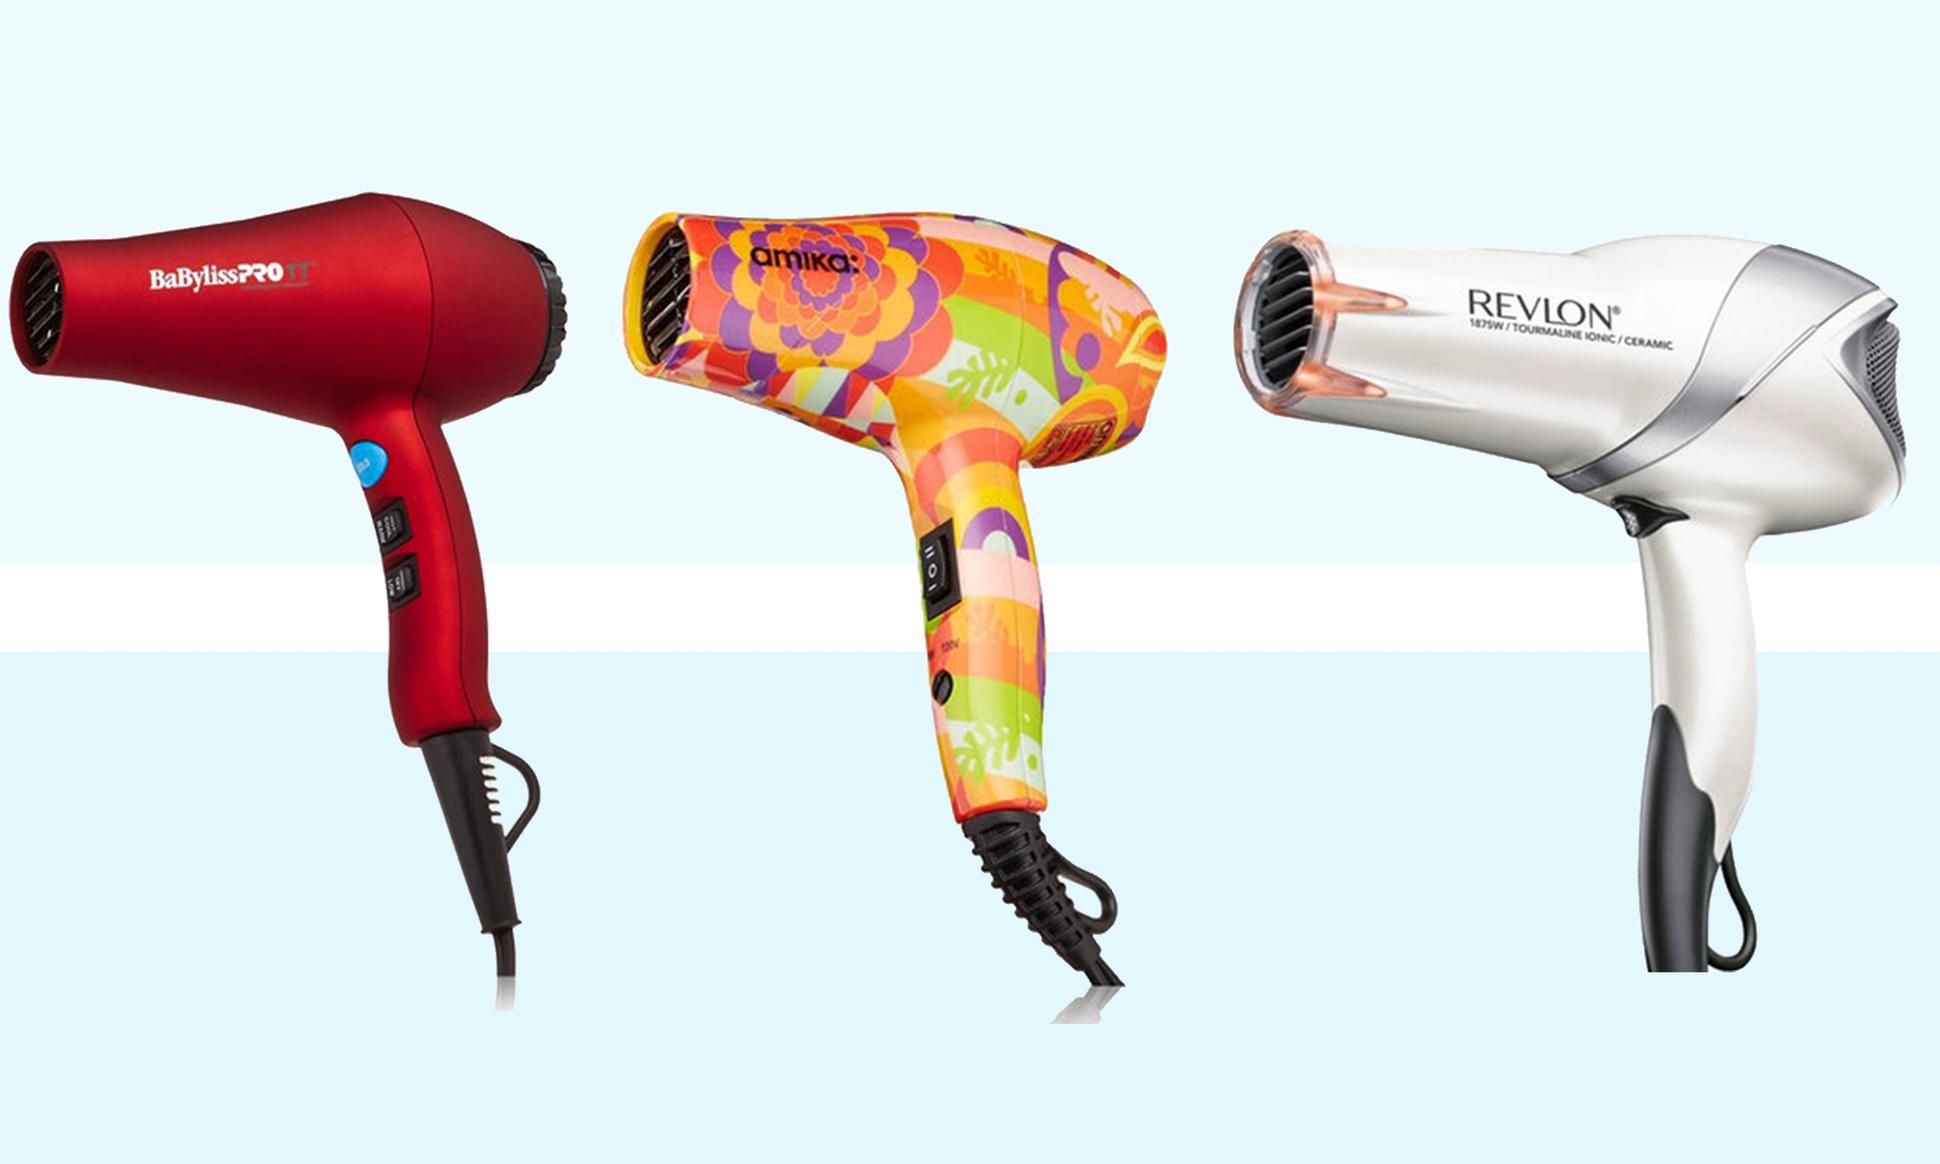 The 5 Best Tourmaline Hair Dryers Tourmaline Hair Dryer Hair Dryer Best Hair Dryer